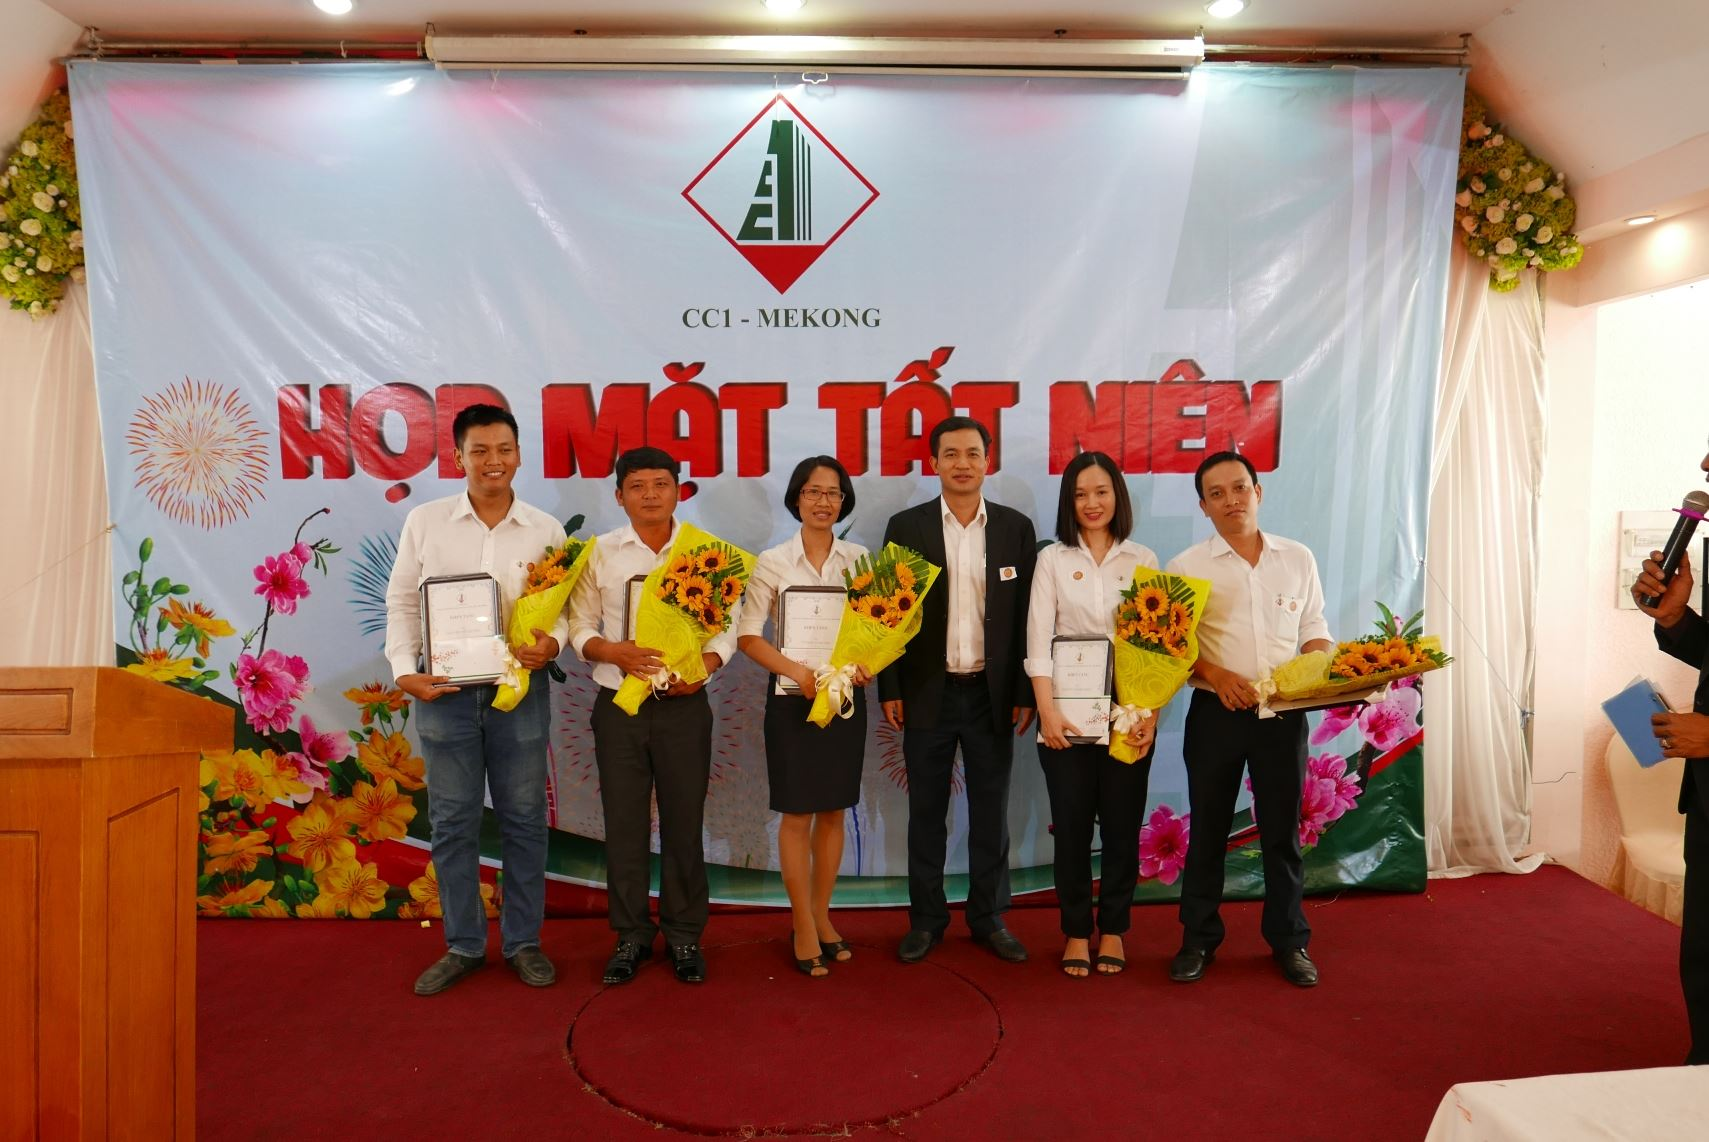 tat-nien-2019-cc1-mekong (11)